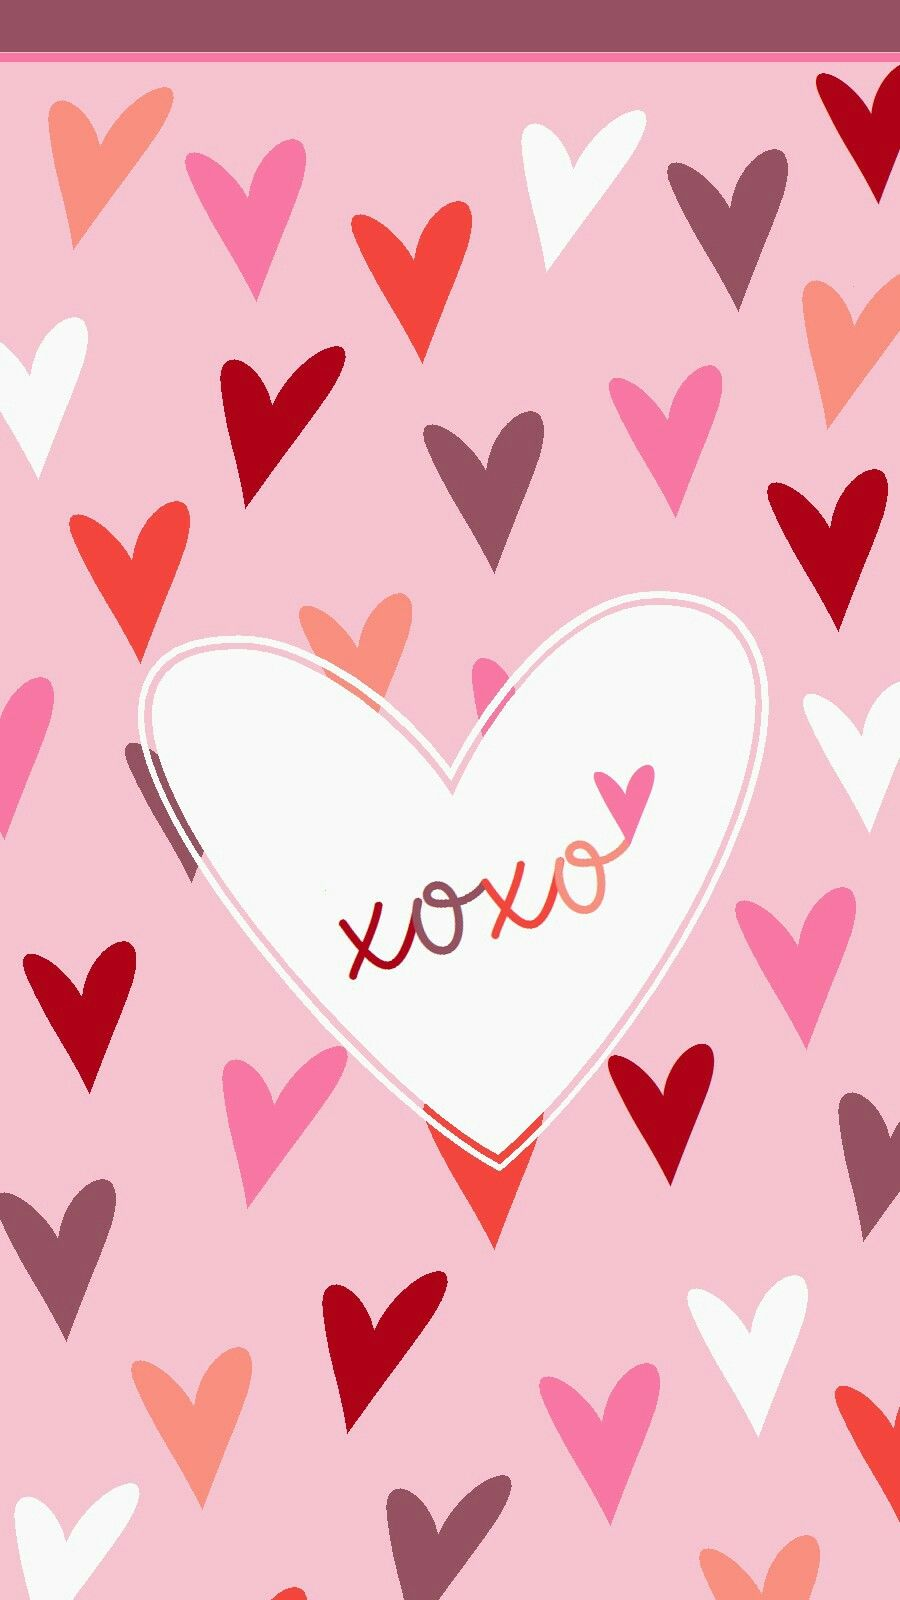 Lovenote5 Valentines Wallpaper Heart Iphone Wallpaper Valentines Day Wallpaper Phone Wallpapers